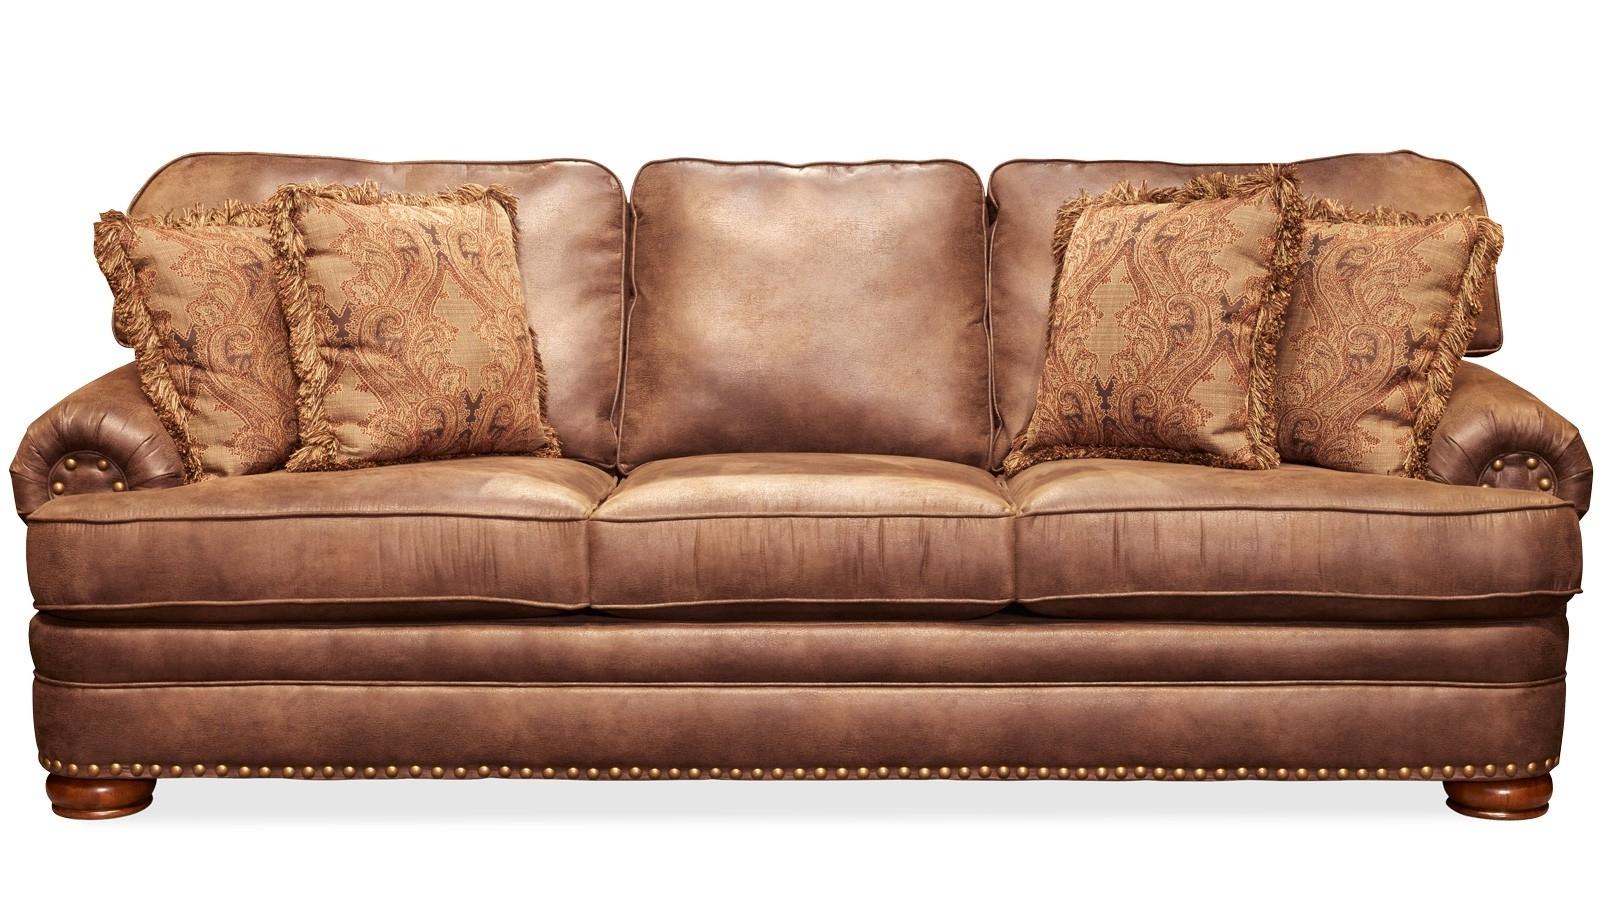 El Paso Texas Sectional Sofas For Trendy El Paso Sofa (View 3 of 15)